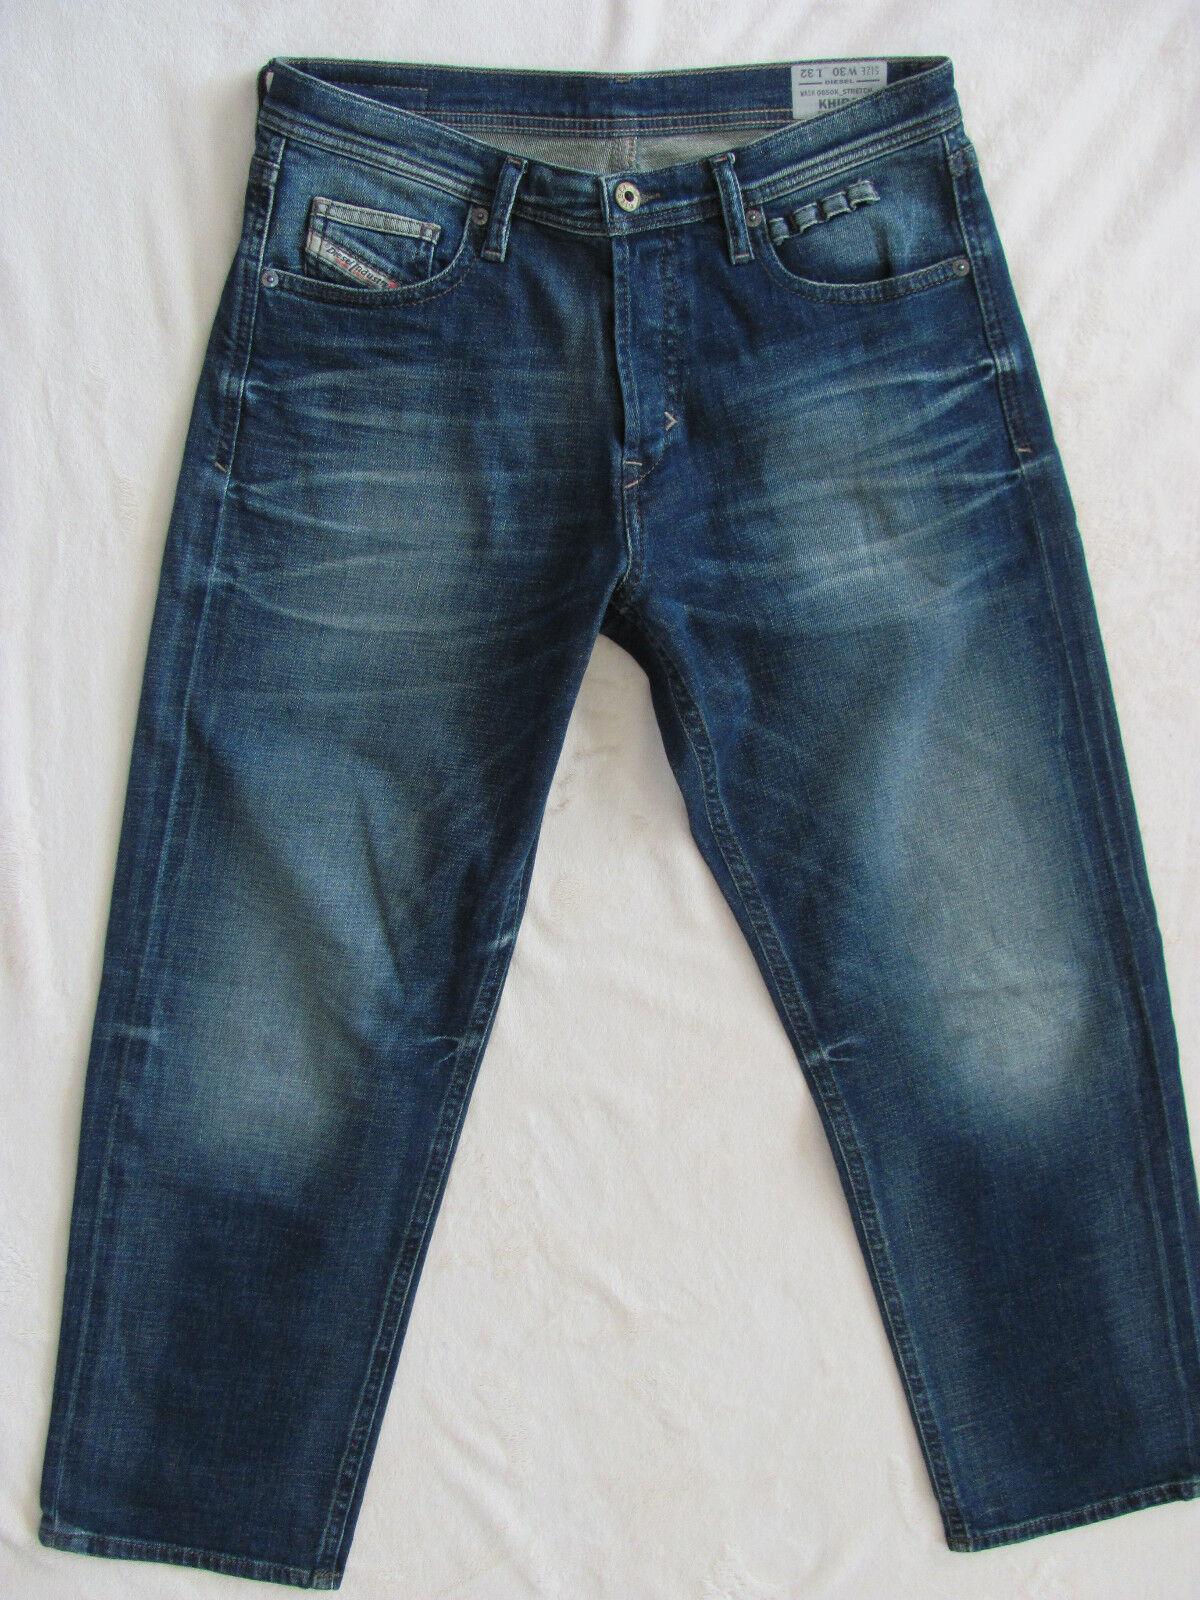 Men's Diesel Khiro Regular Straight Jeans Wash 0850K -Size 30 L28 NWT